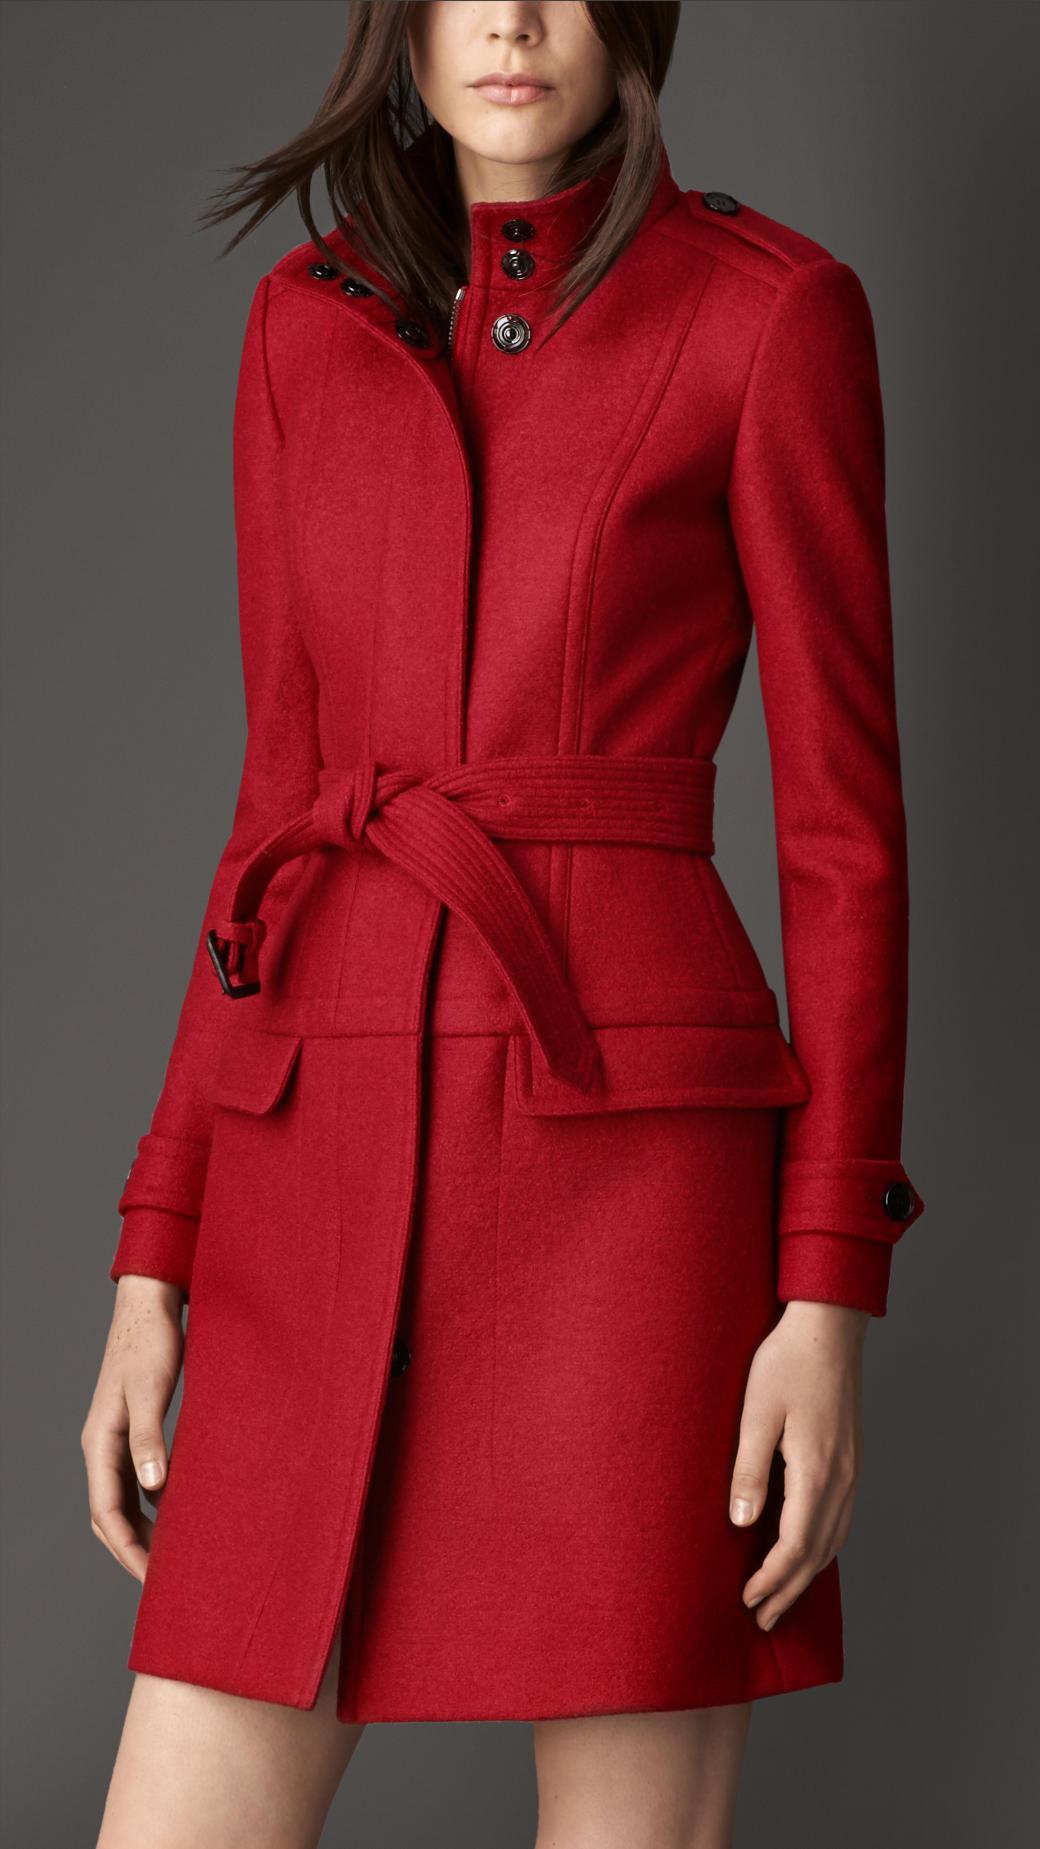 Red Coat Wool - JacketIn